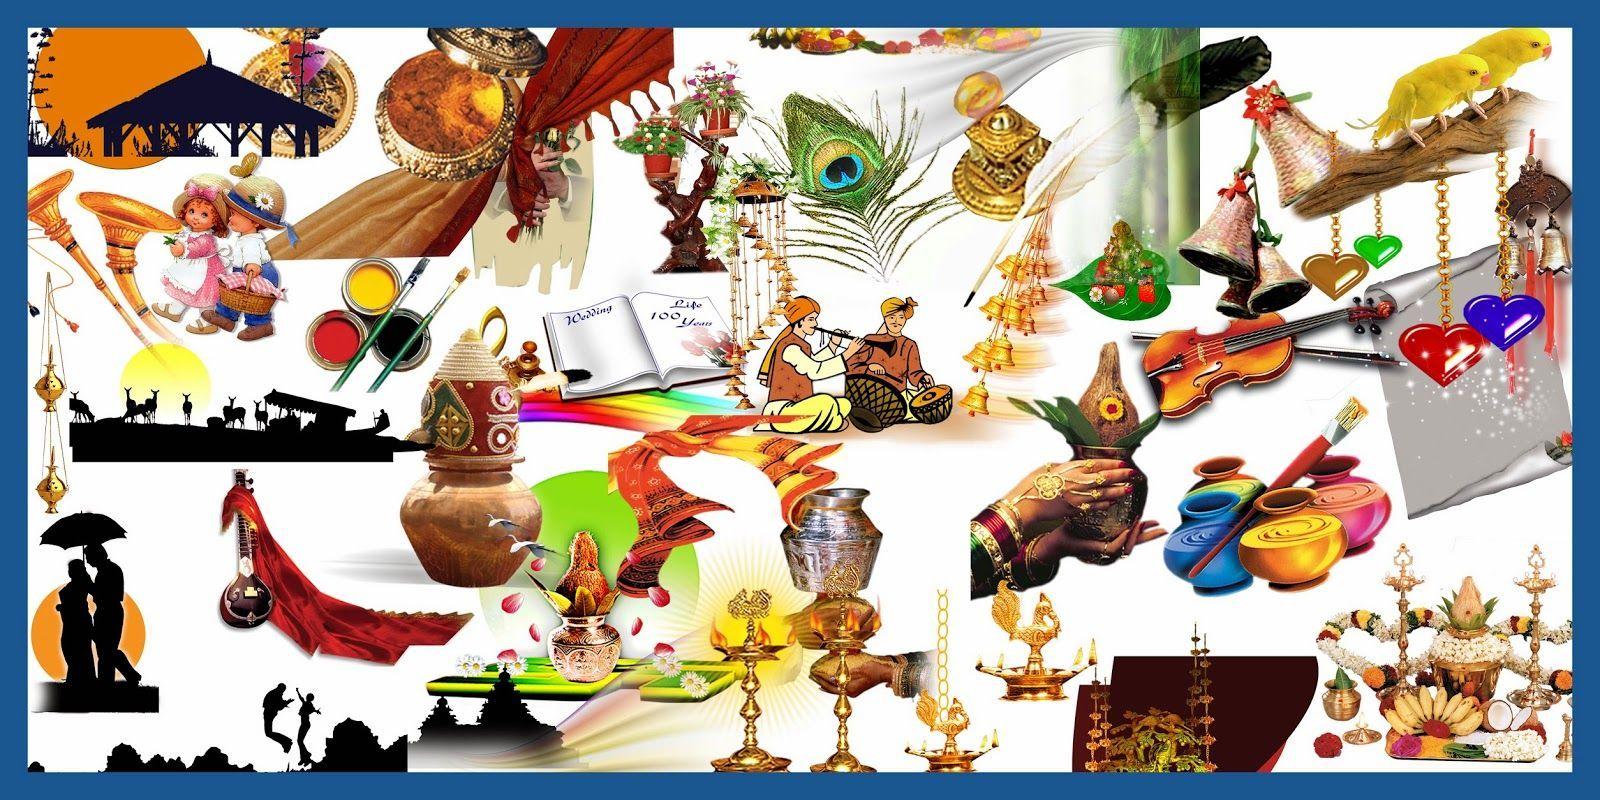 Www.NaveenGFX.com: Wedding Elements PSD File.